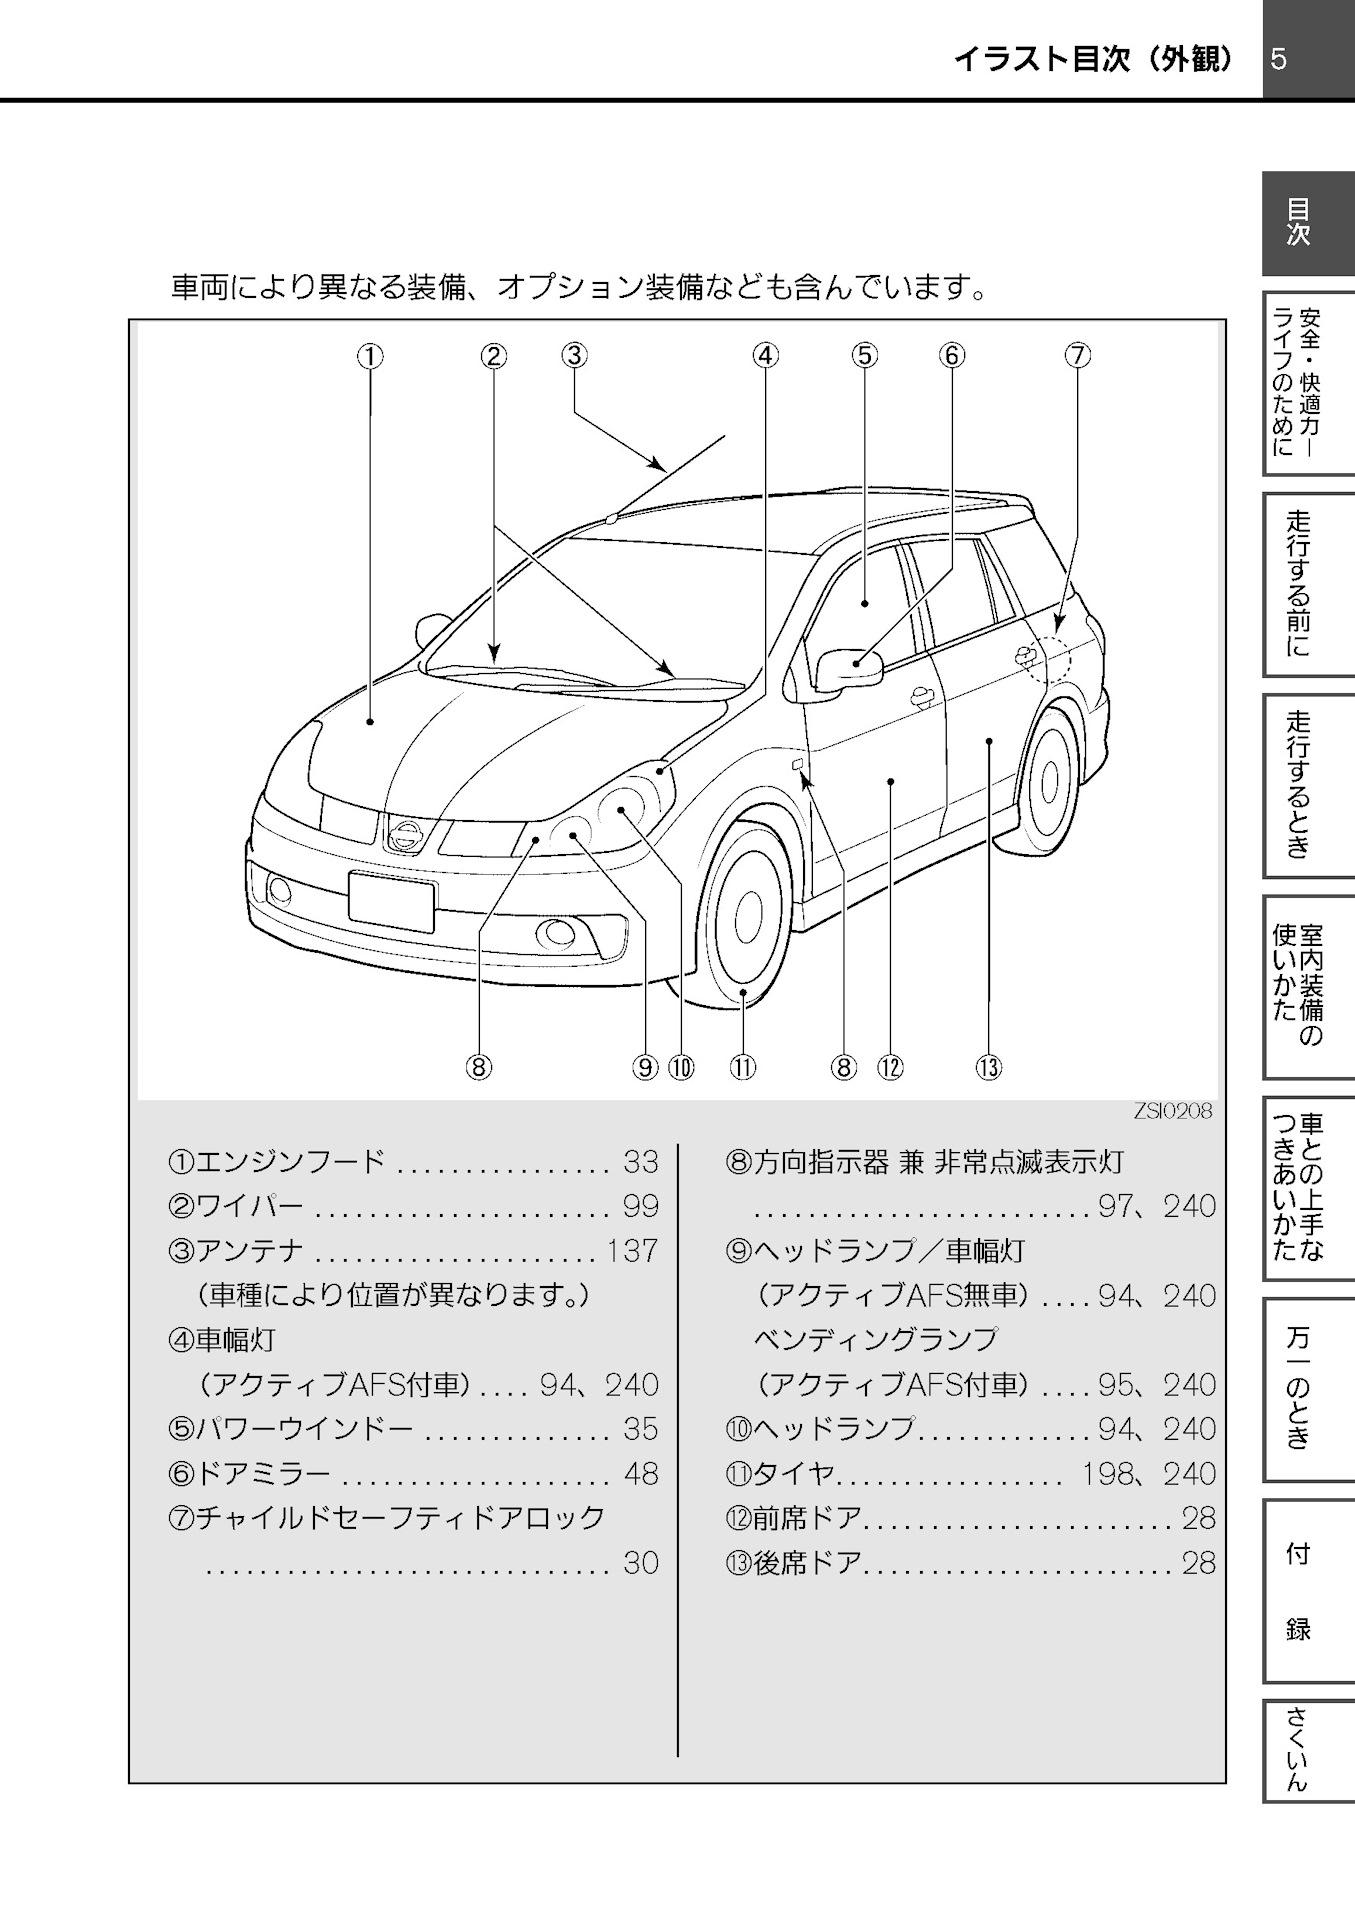 operating instructions nissan wingroad y12 japanese 250 pages rh drive2 com Nissan Wingroad Y12 Trim nissan wingroad y12 workshop manual